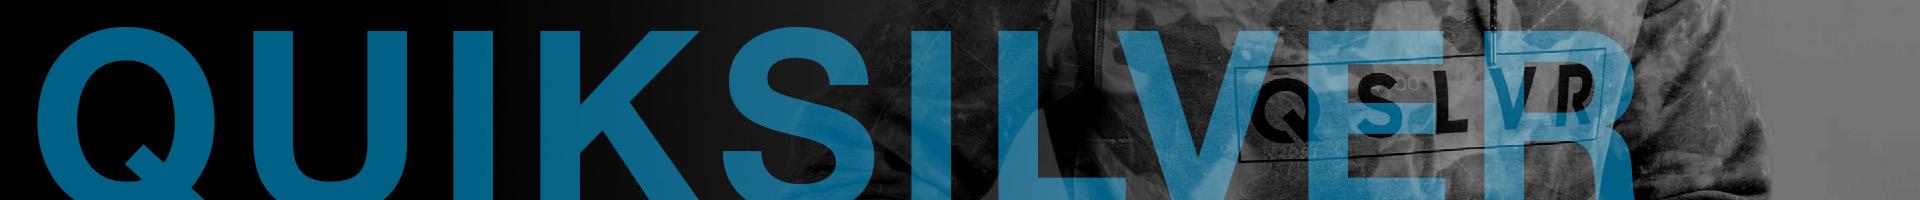 QUIKSILVER - MEN'S & BOY'S SKI + SNOWBOARD OUTERWEAR